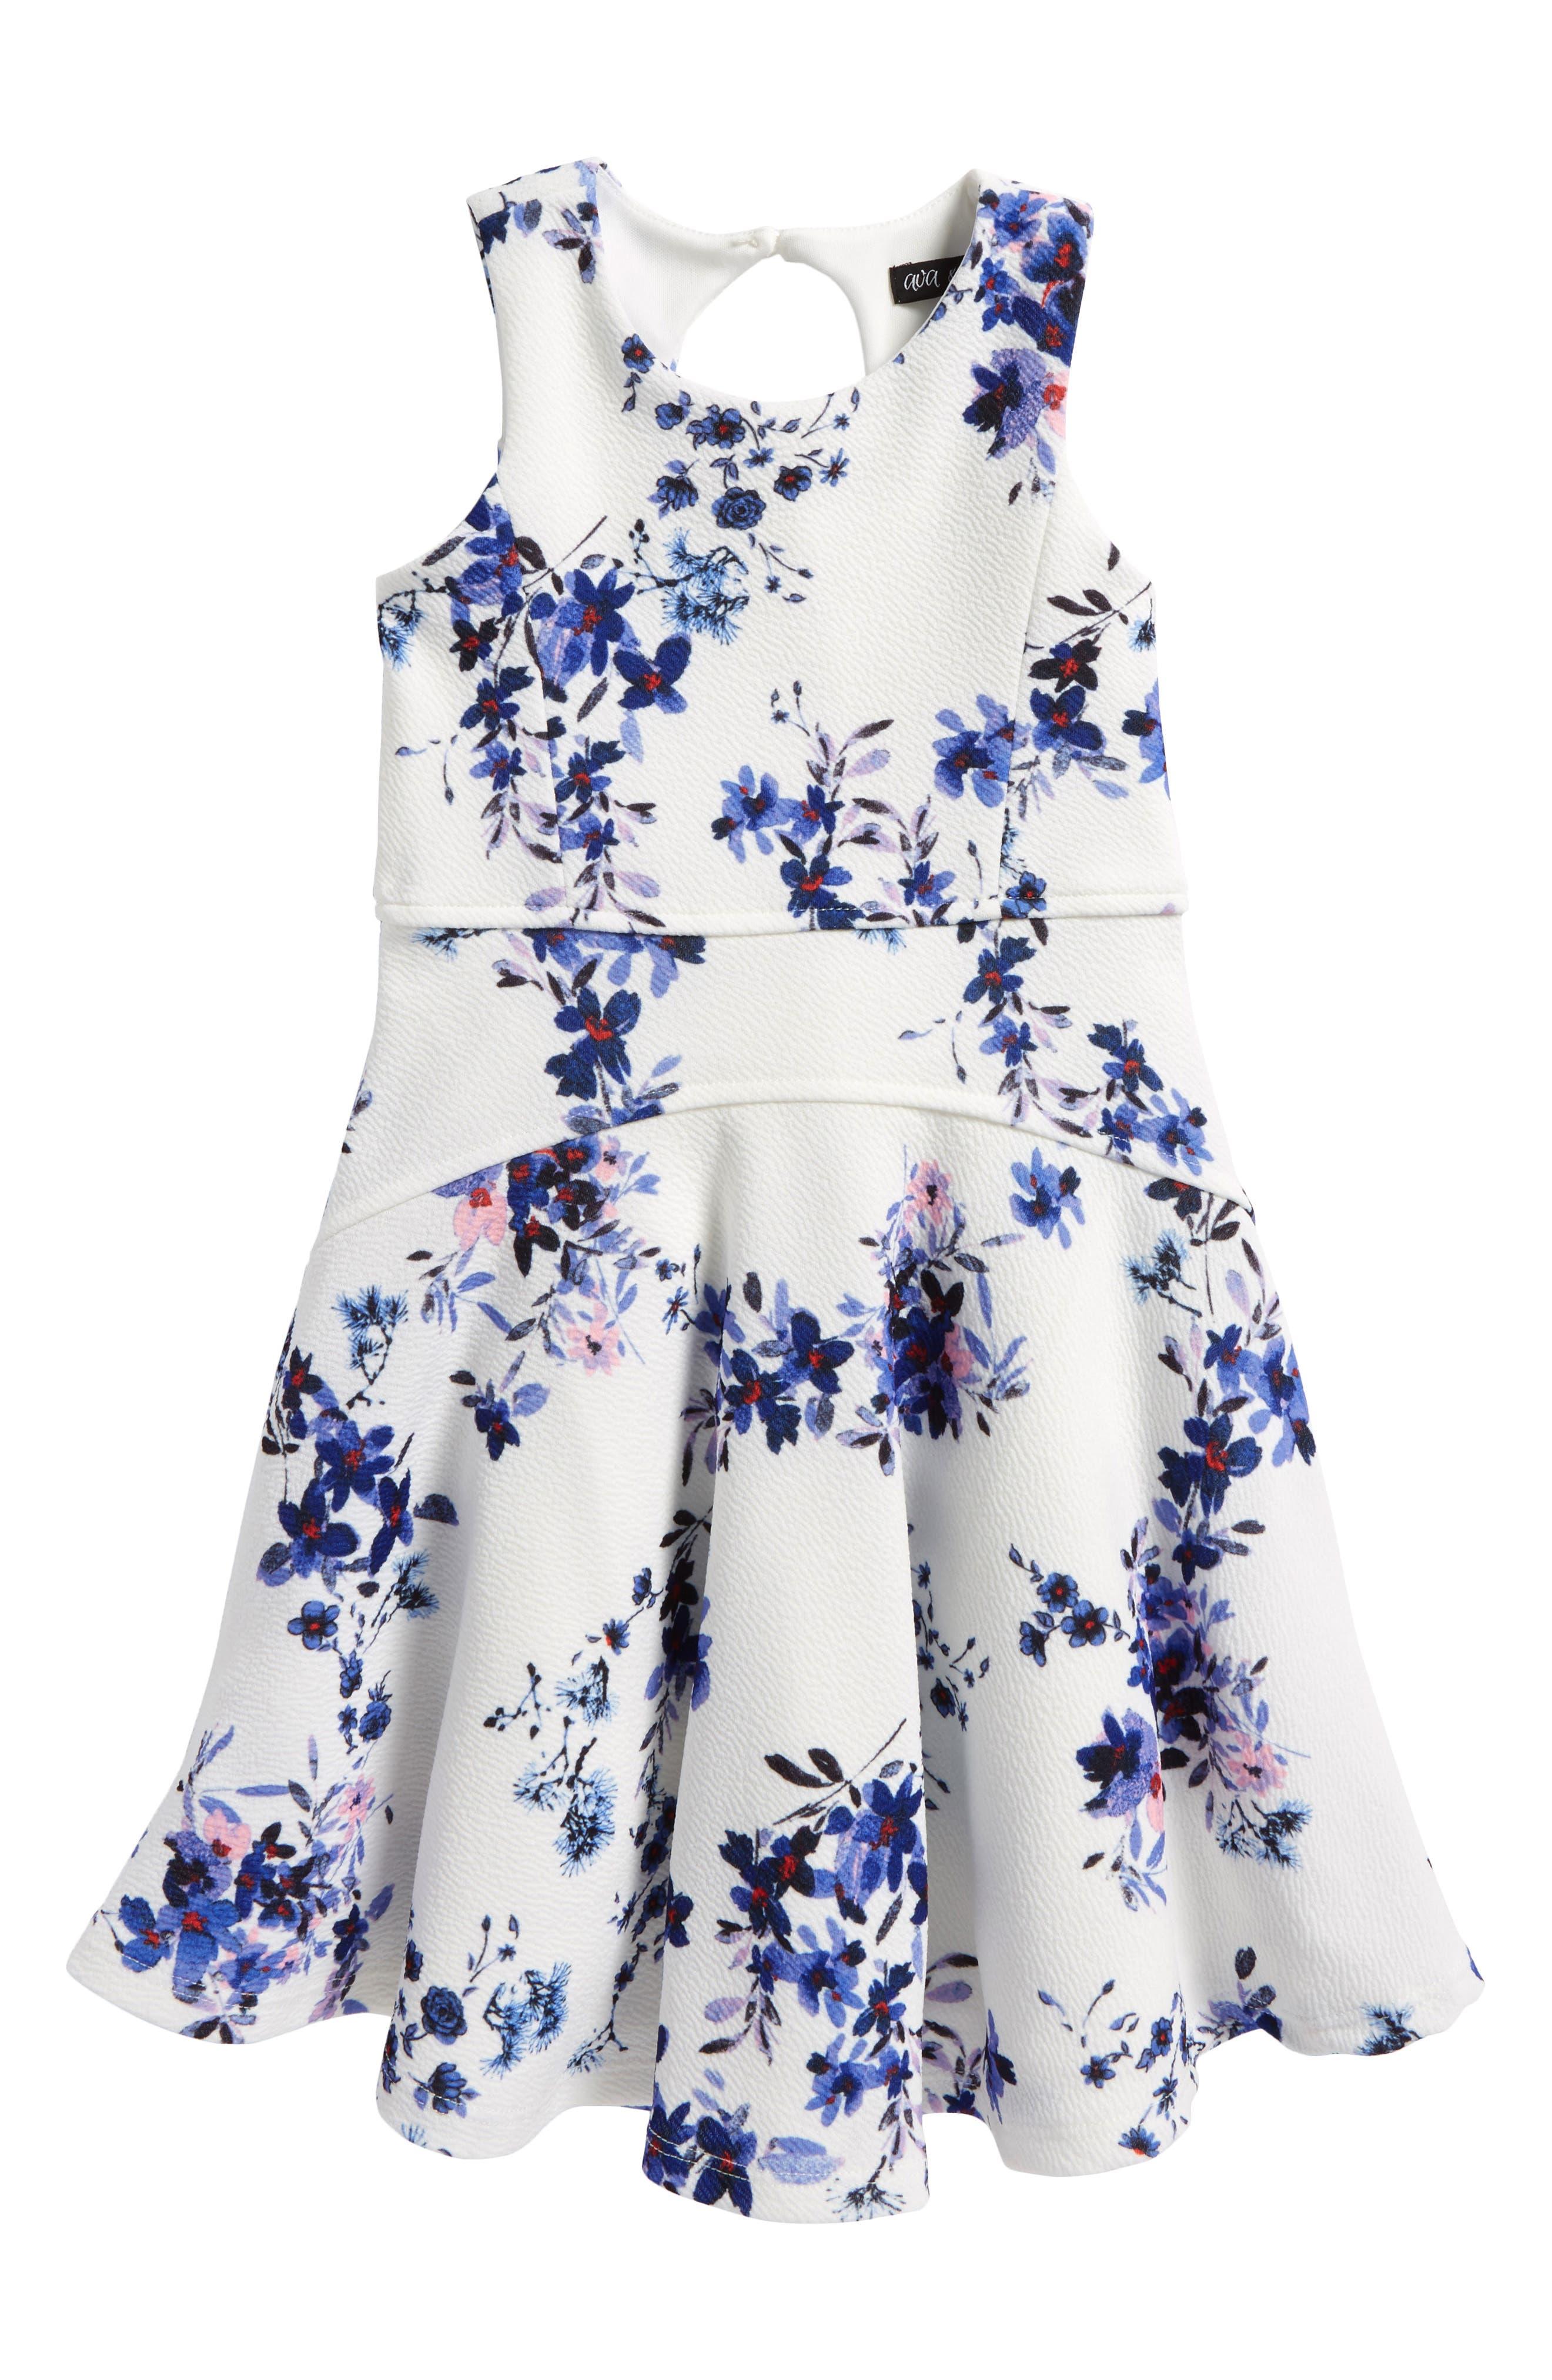 Floral Print Skater Dress,                         Main,                         color, White/ Blue